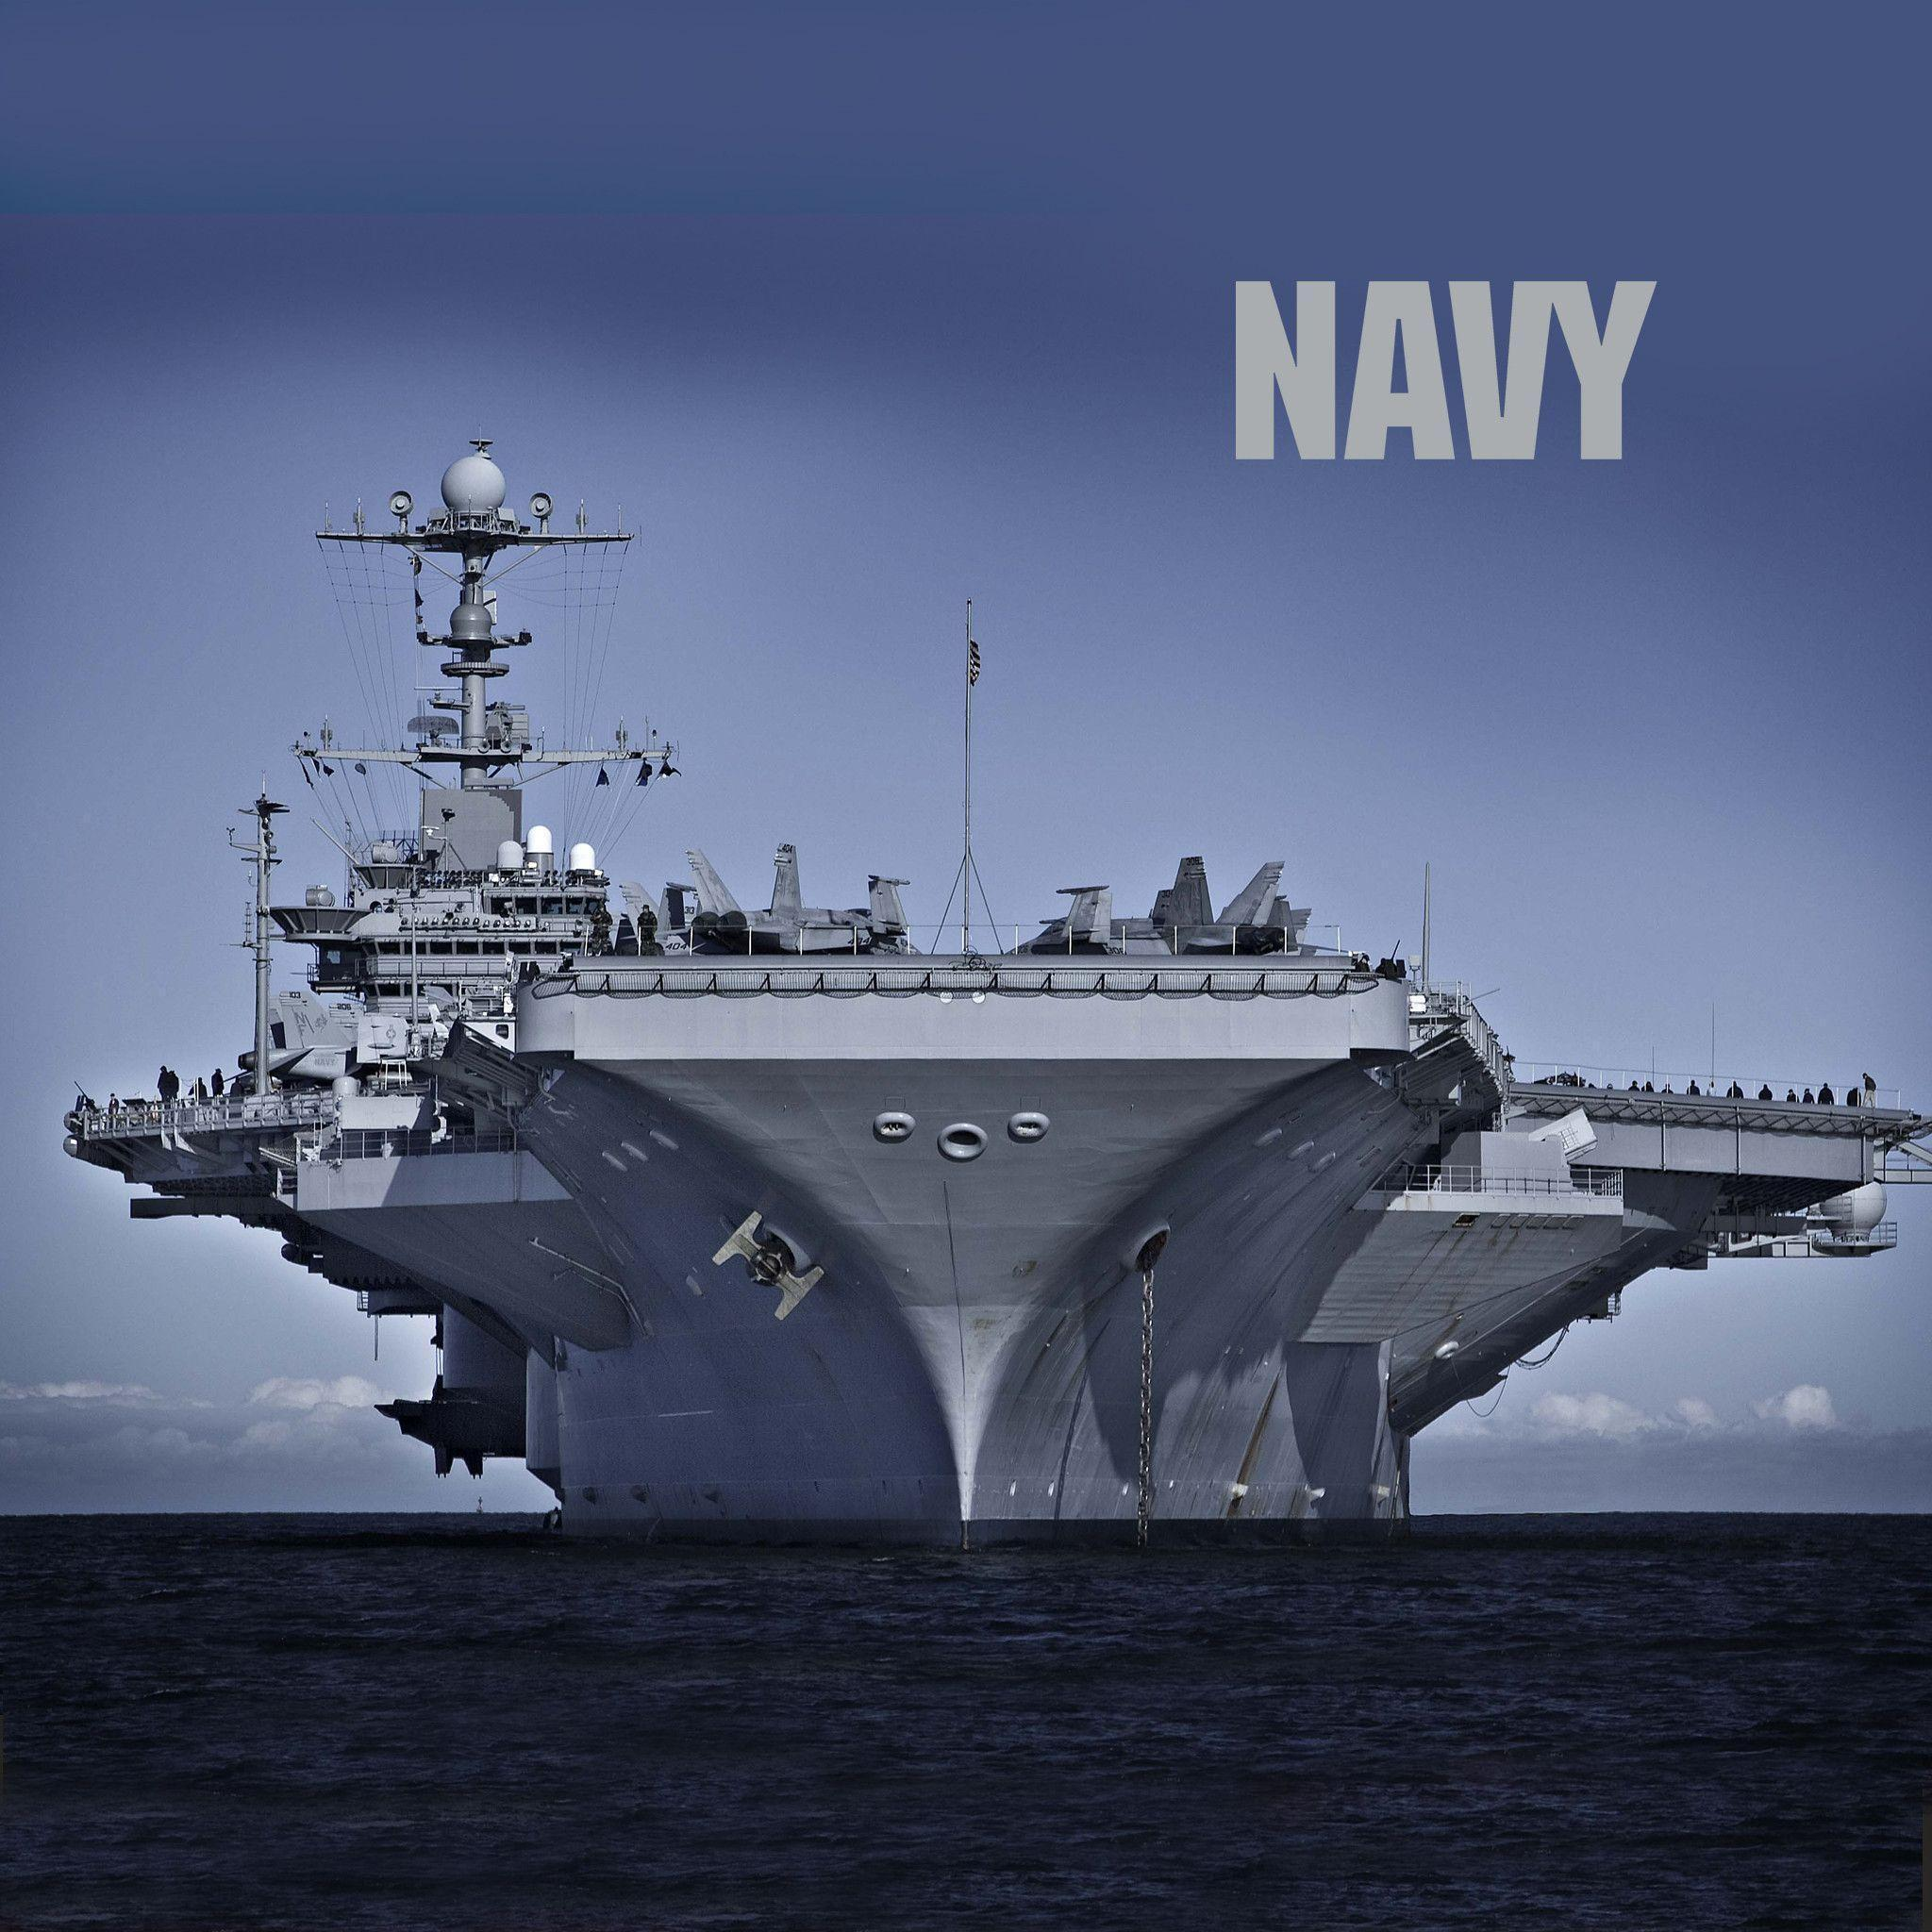 US Navy Wallpapers 2048x2048